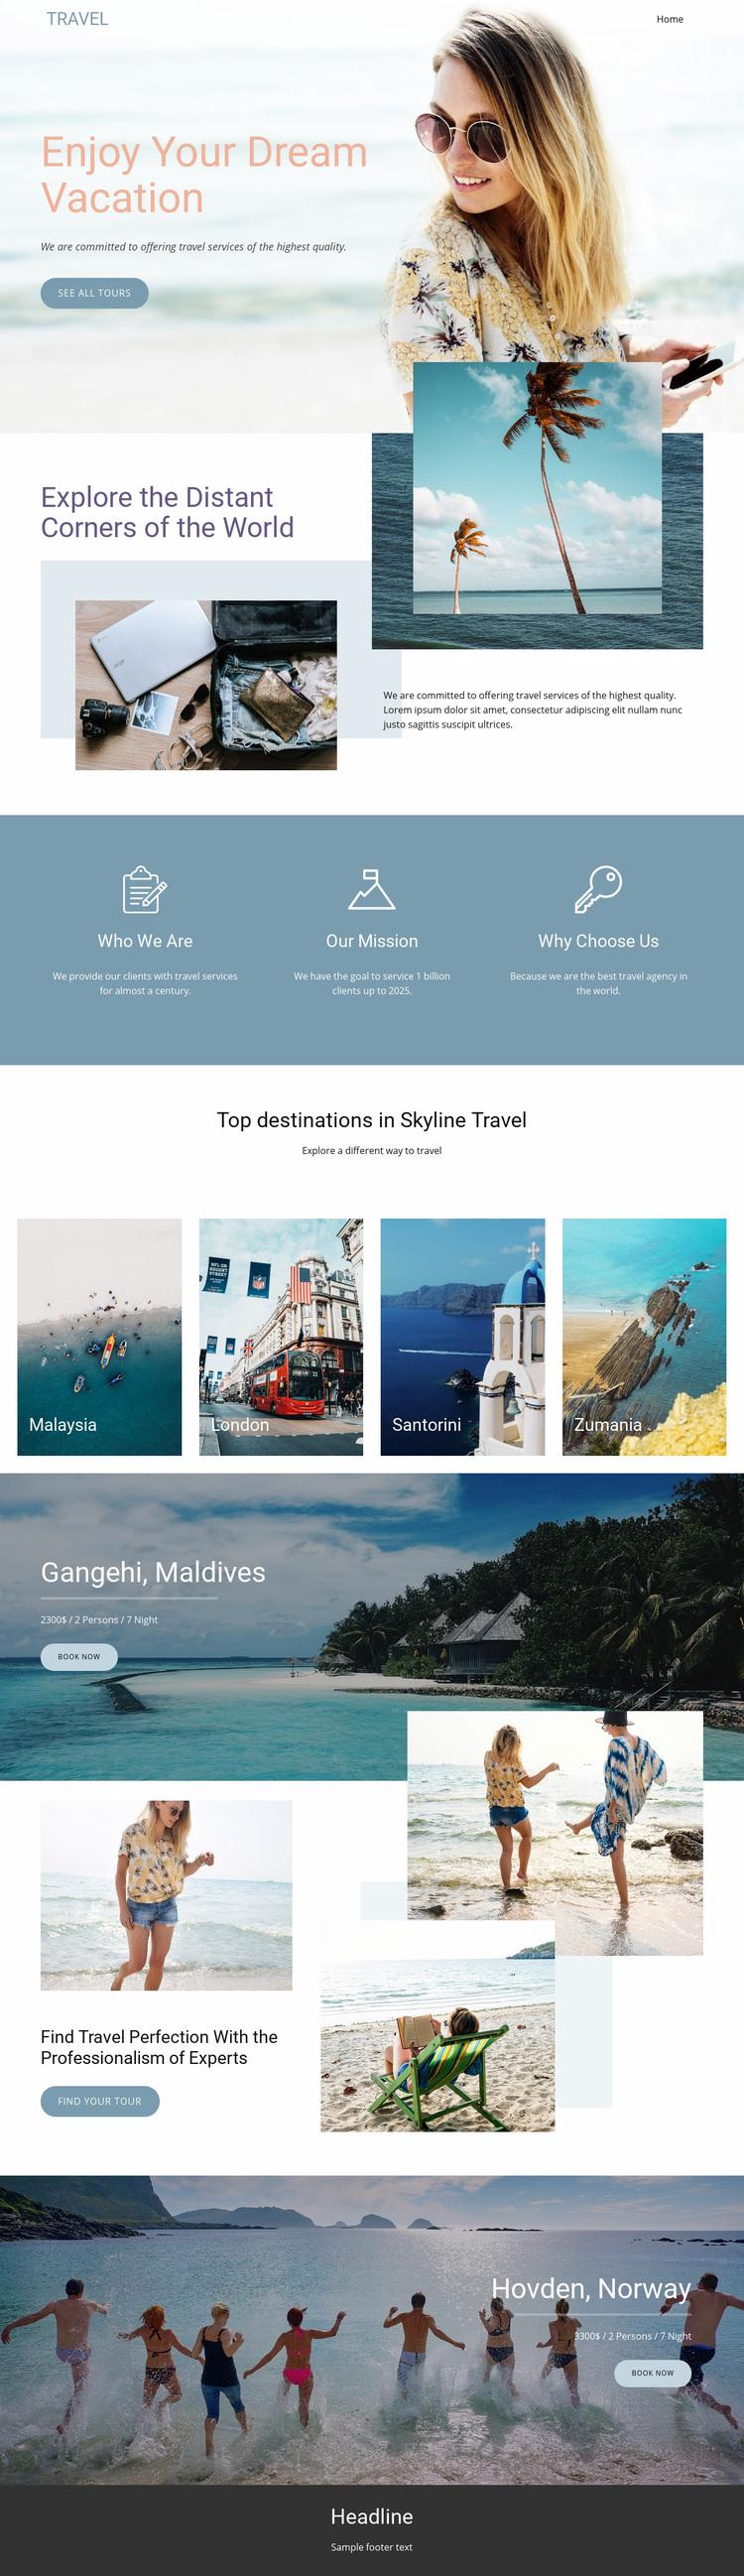 Dream Travel Agency Web Page Designer